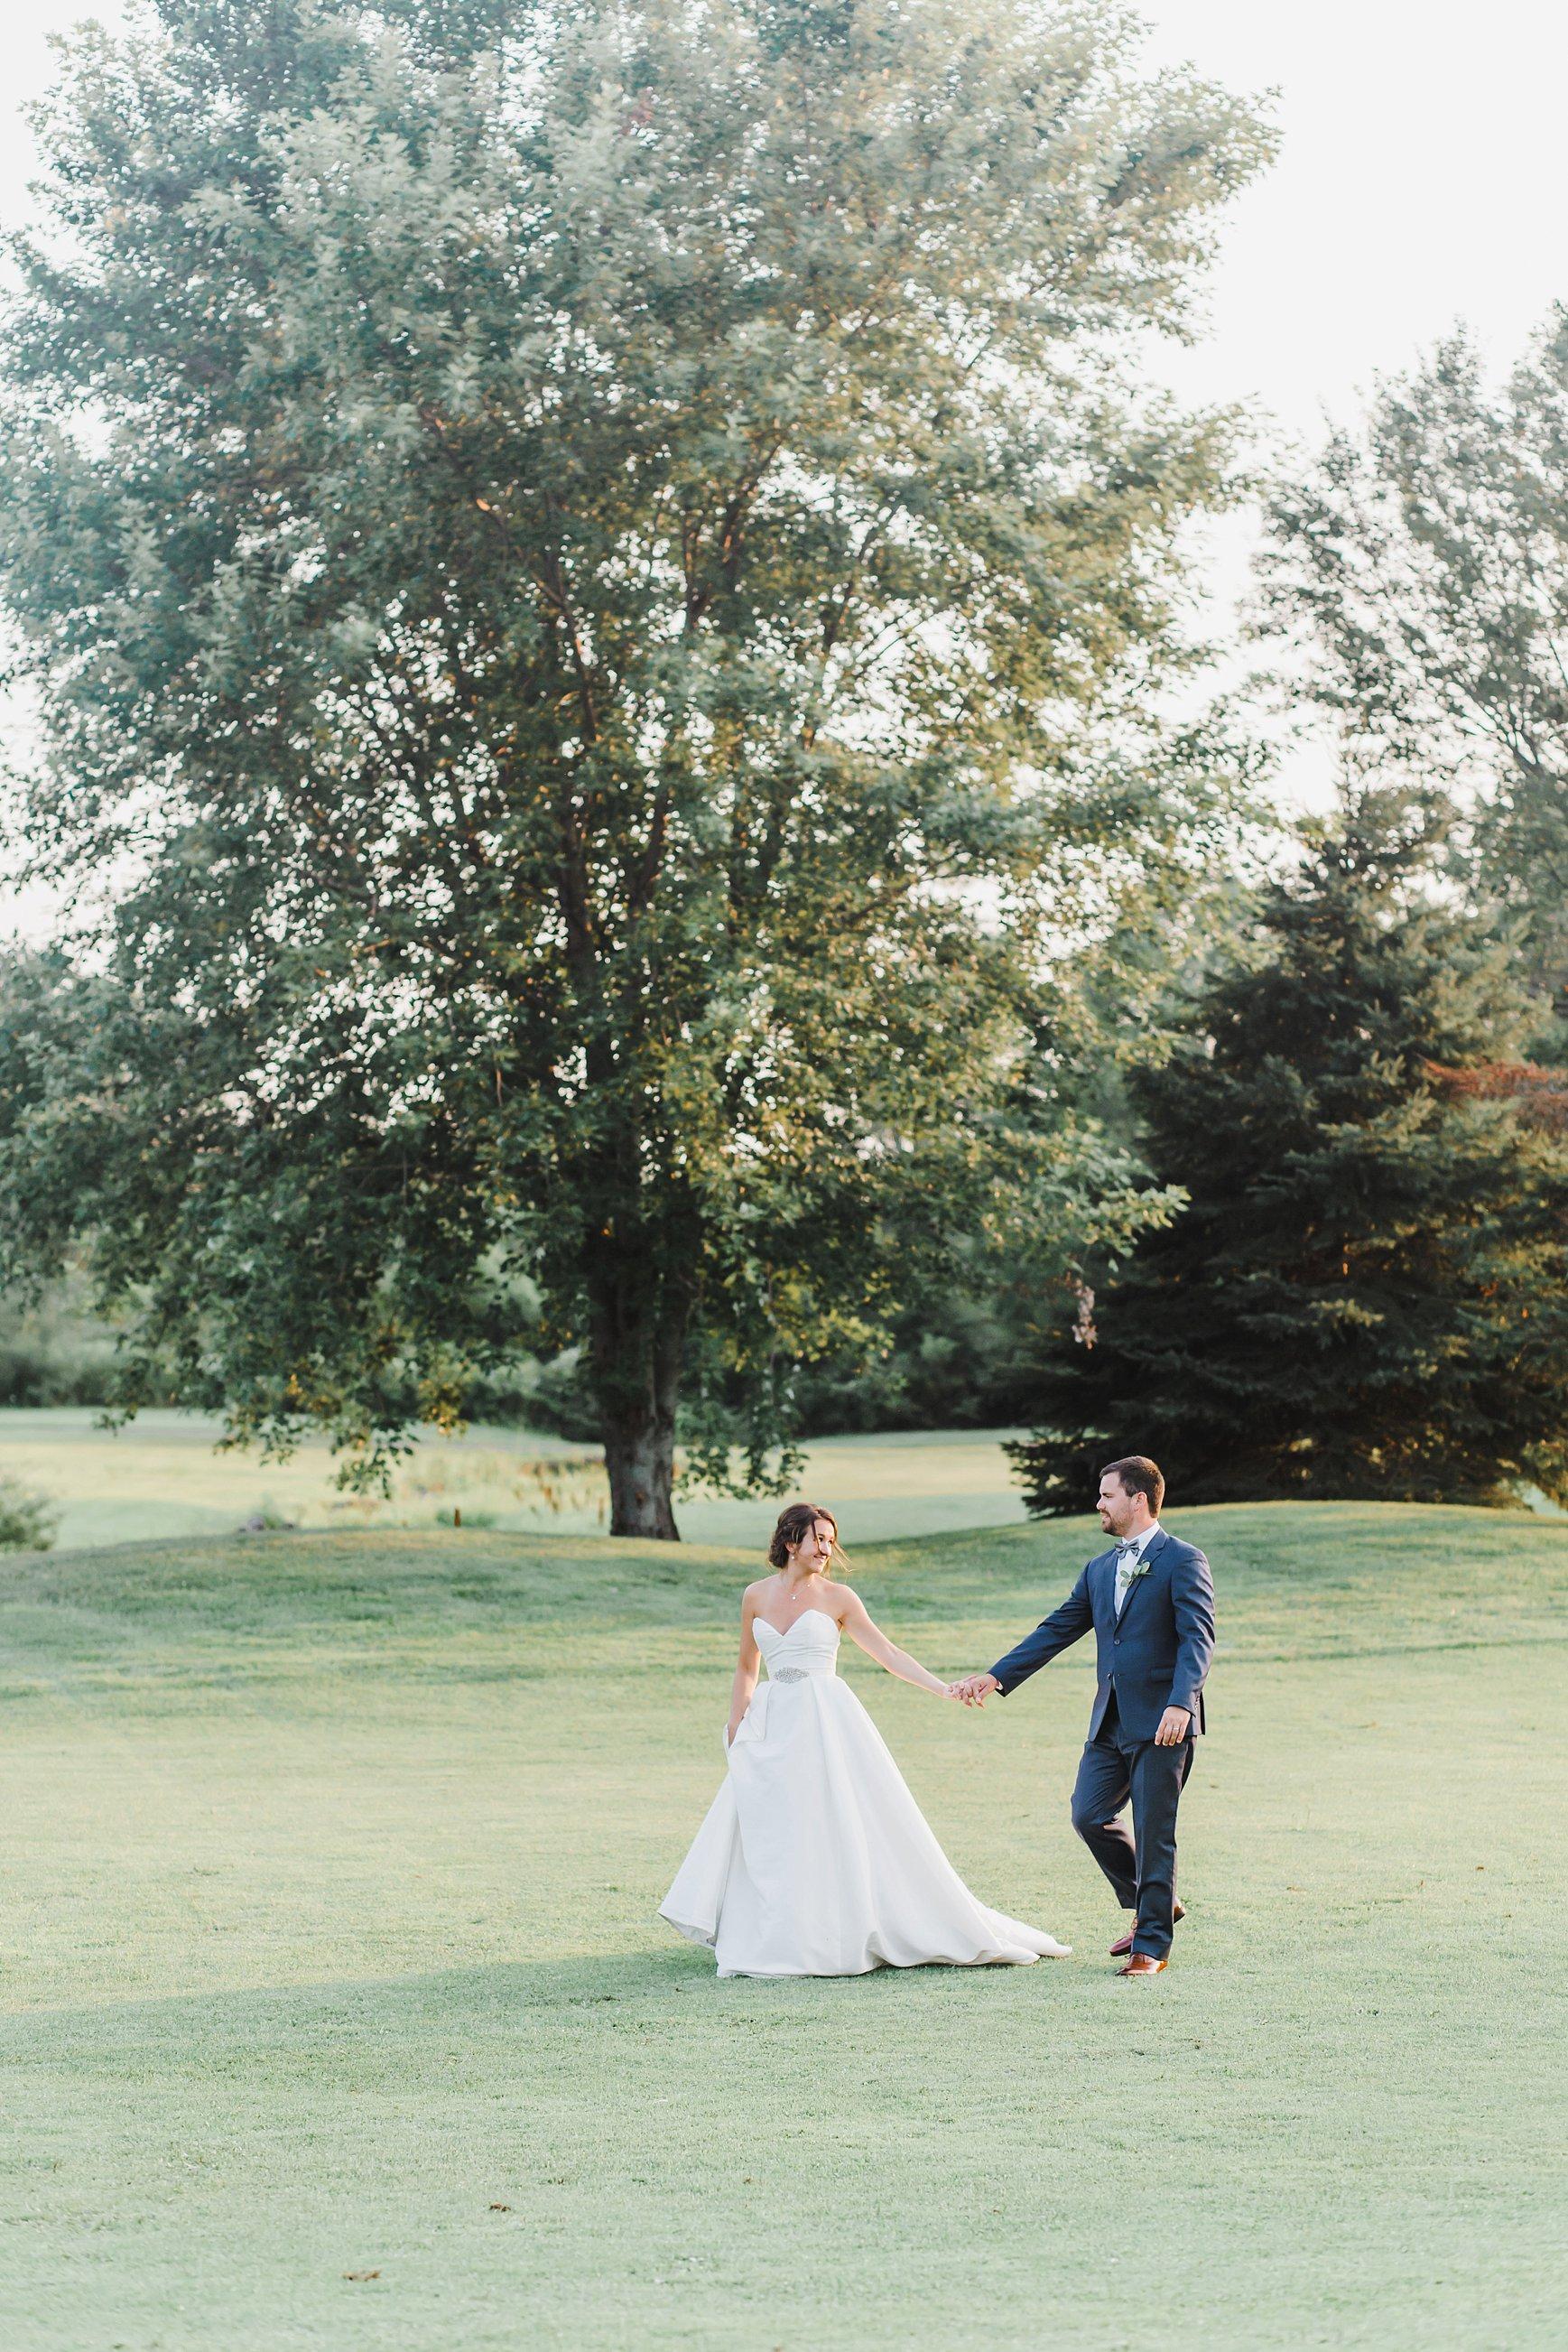 light airy indie fine art ottawa wedding photographer | Ali and Batoul Photography_0578.jpg